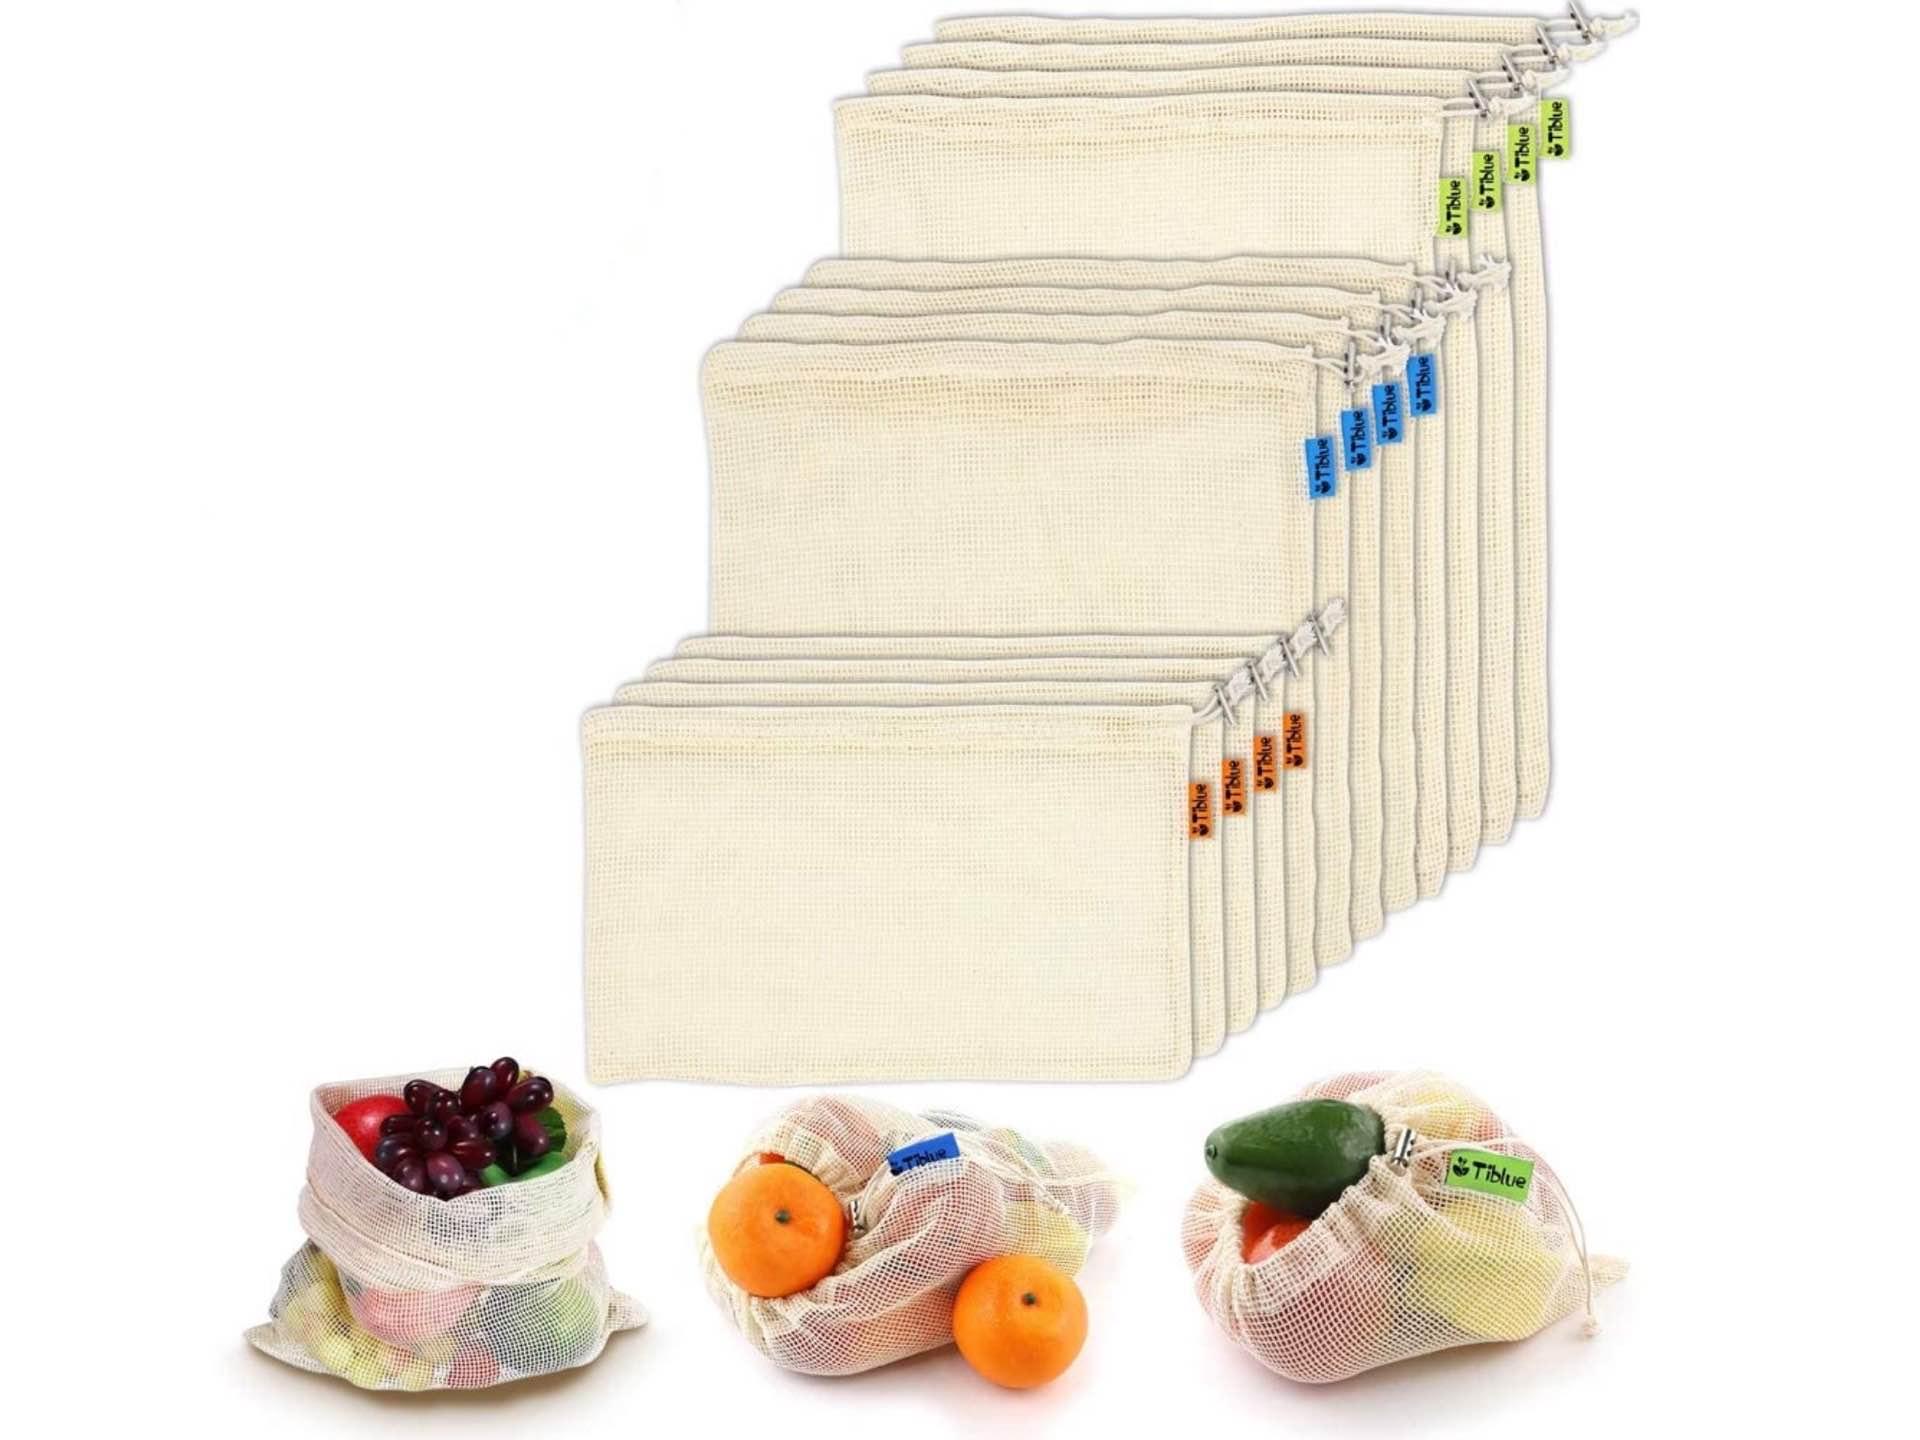 tiblue-reusable-organic-cotton-mesh-produce-bags